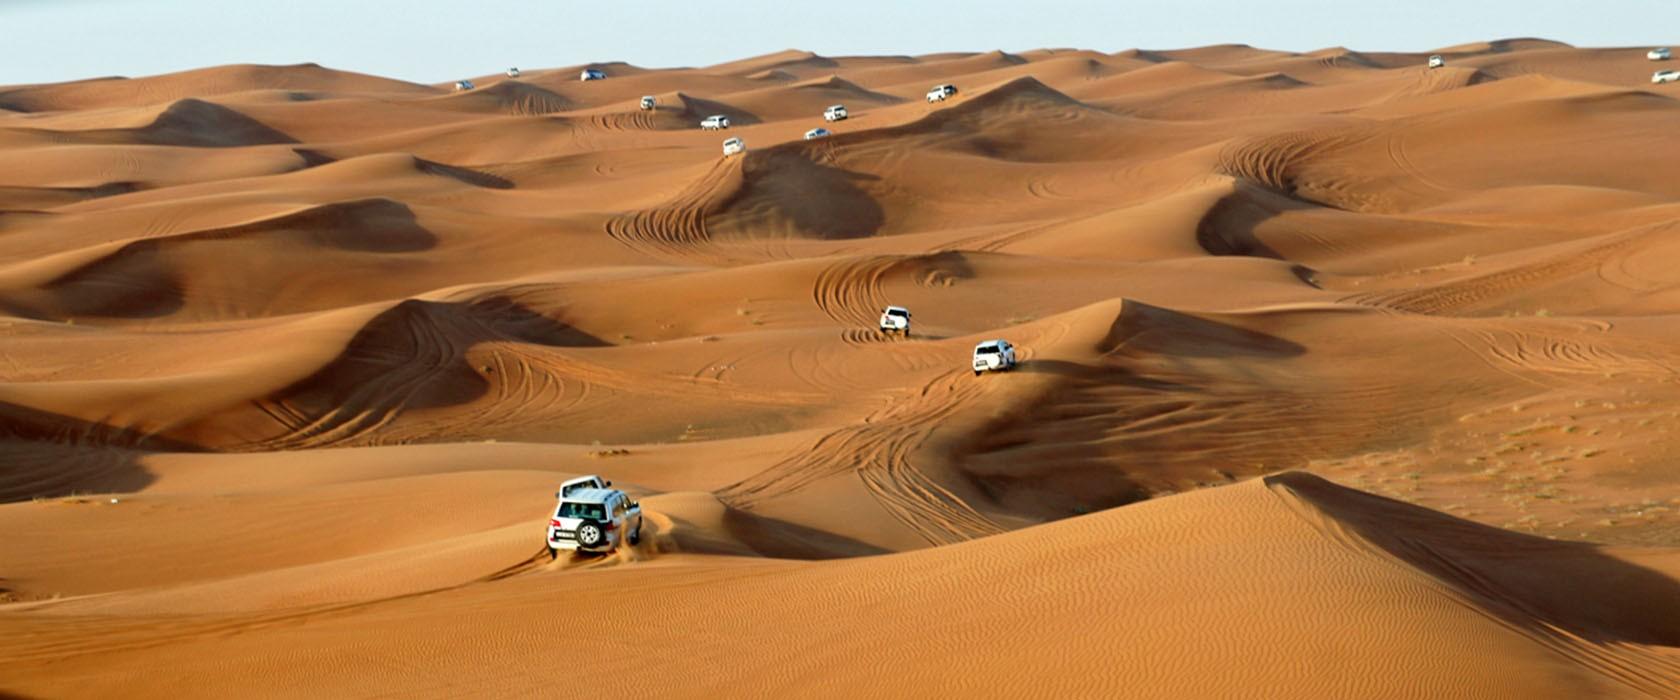 desert safari dubai 4x4 woestijntocht alles over dubai. Black Bedroom Furniture Sets. Home Design Ideas